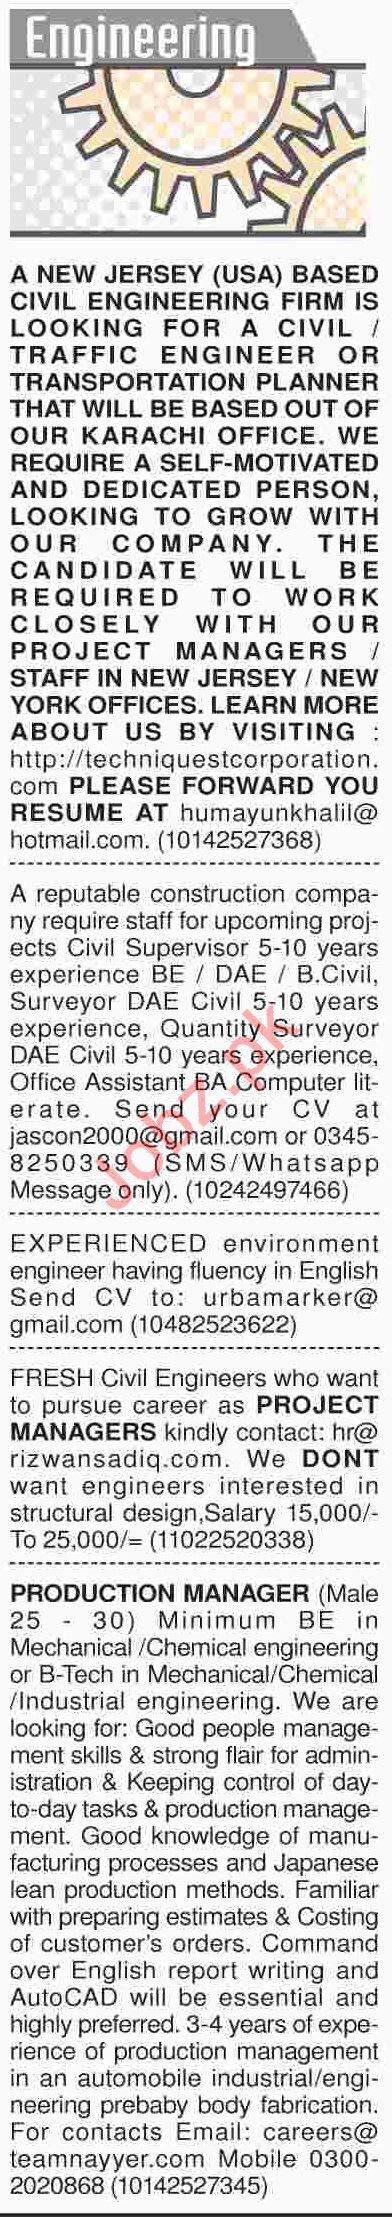 Dawn Sunday Newspaper Engineering Classified Jobs 03/02/2019